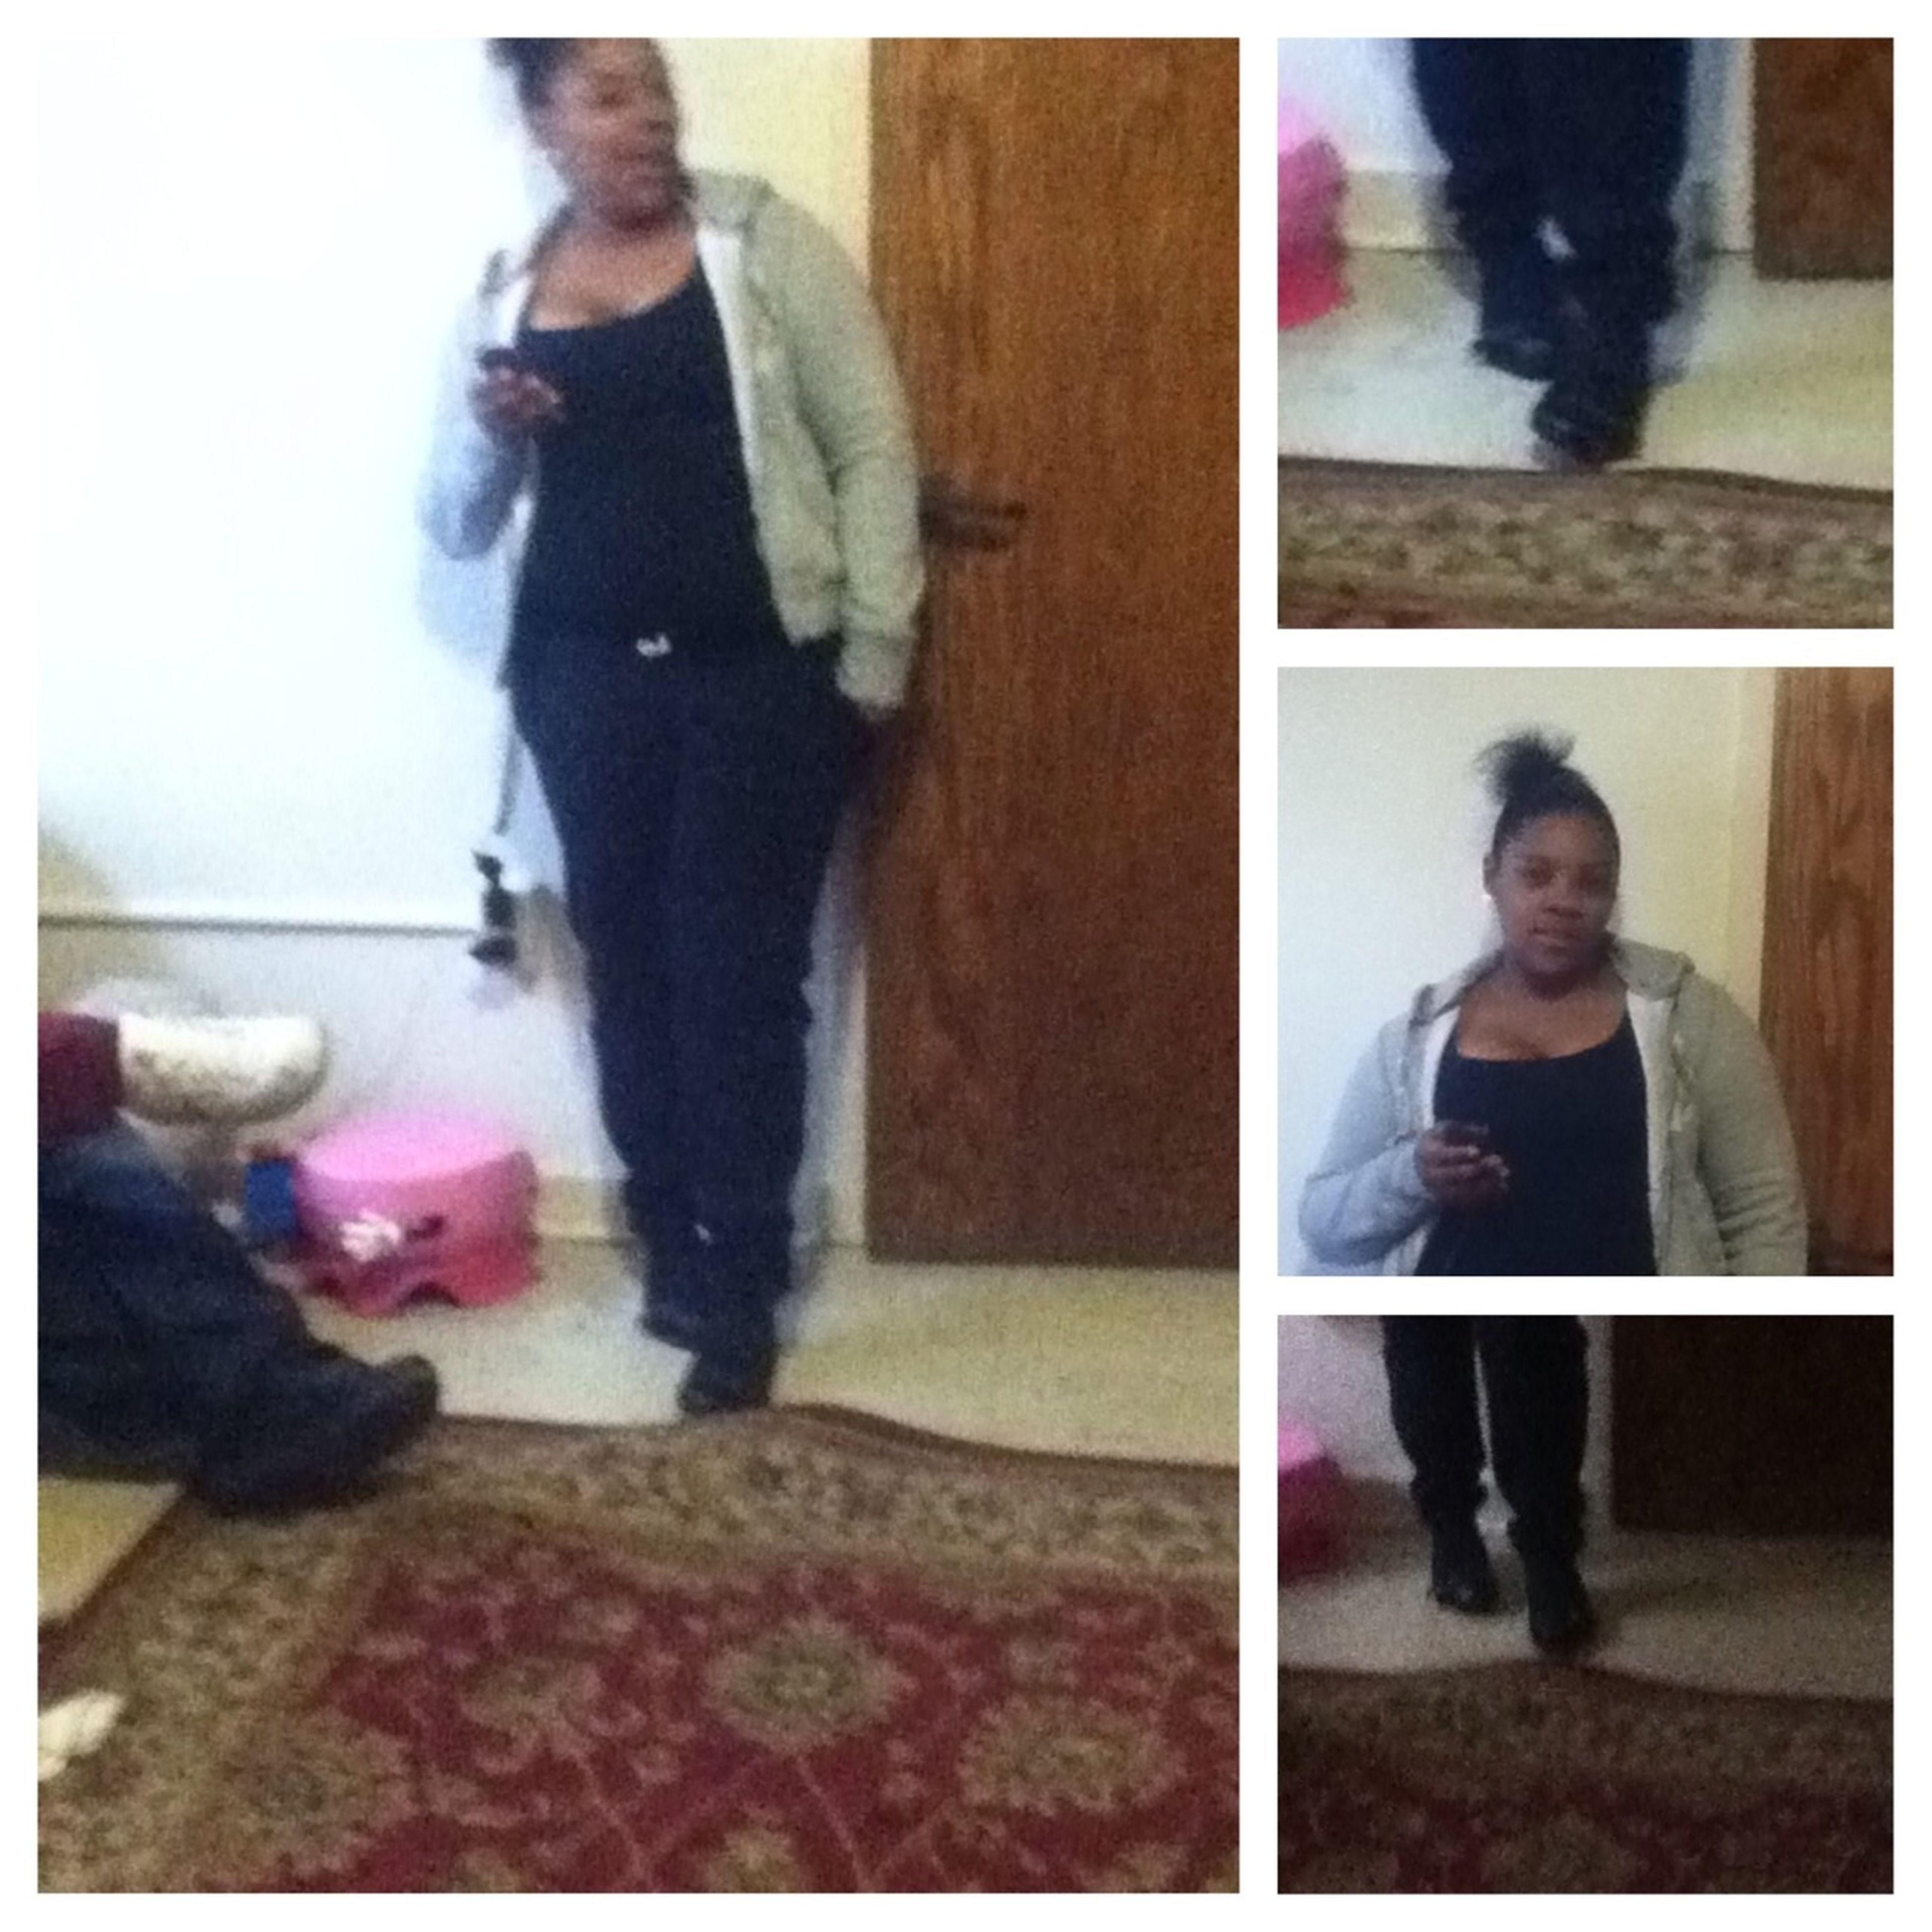 Zaynah #weirdo #silly #flats #socks #blackk